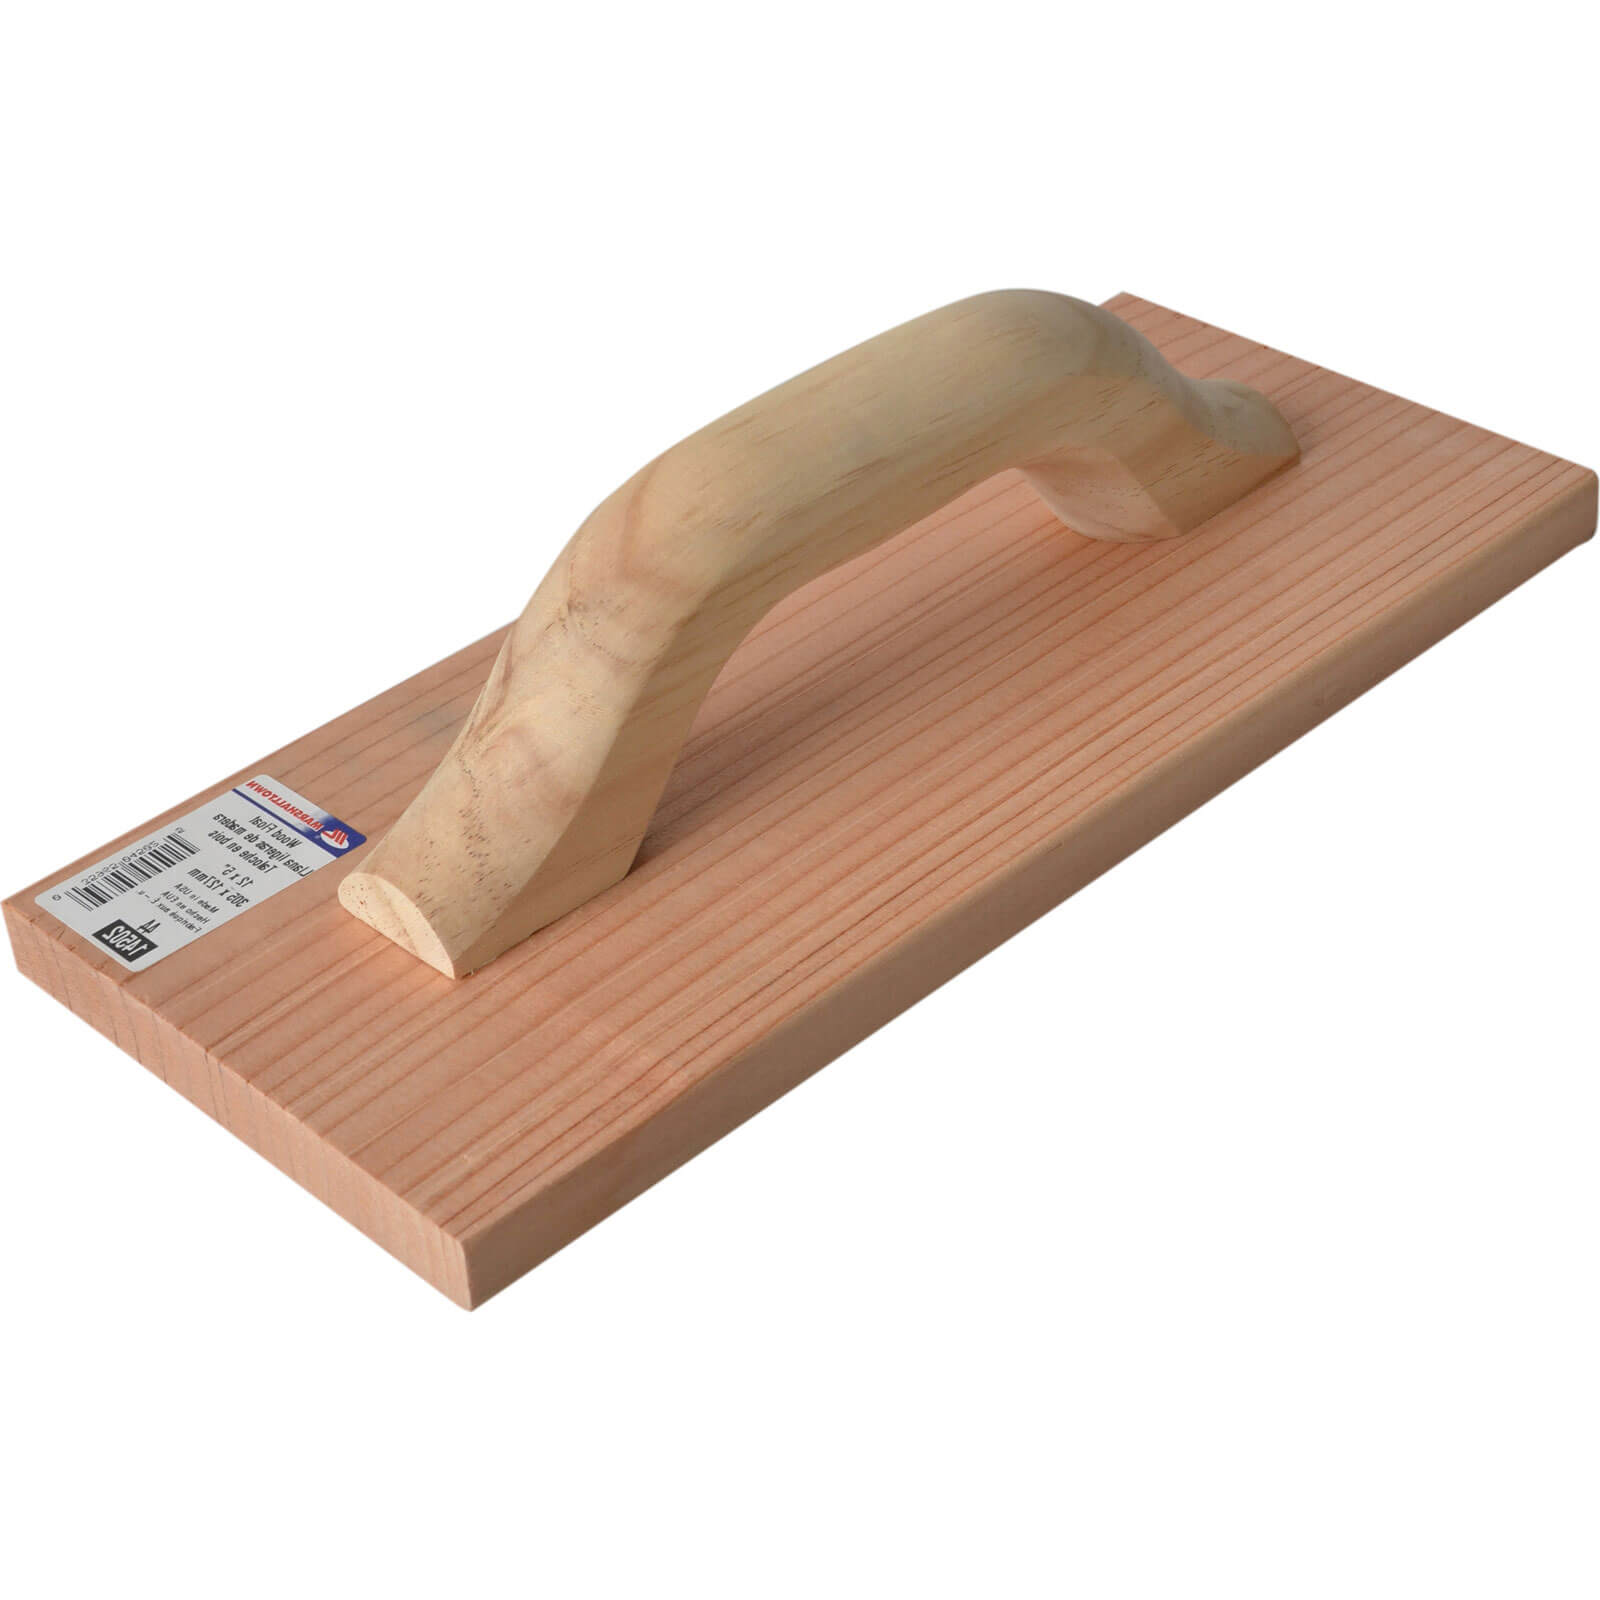 Image of Marshalltown Straight Grain Wood Float